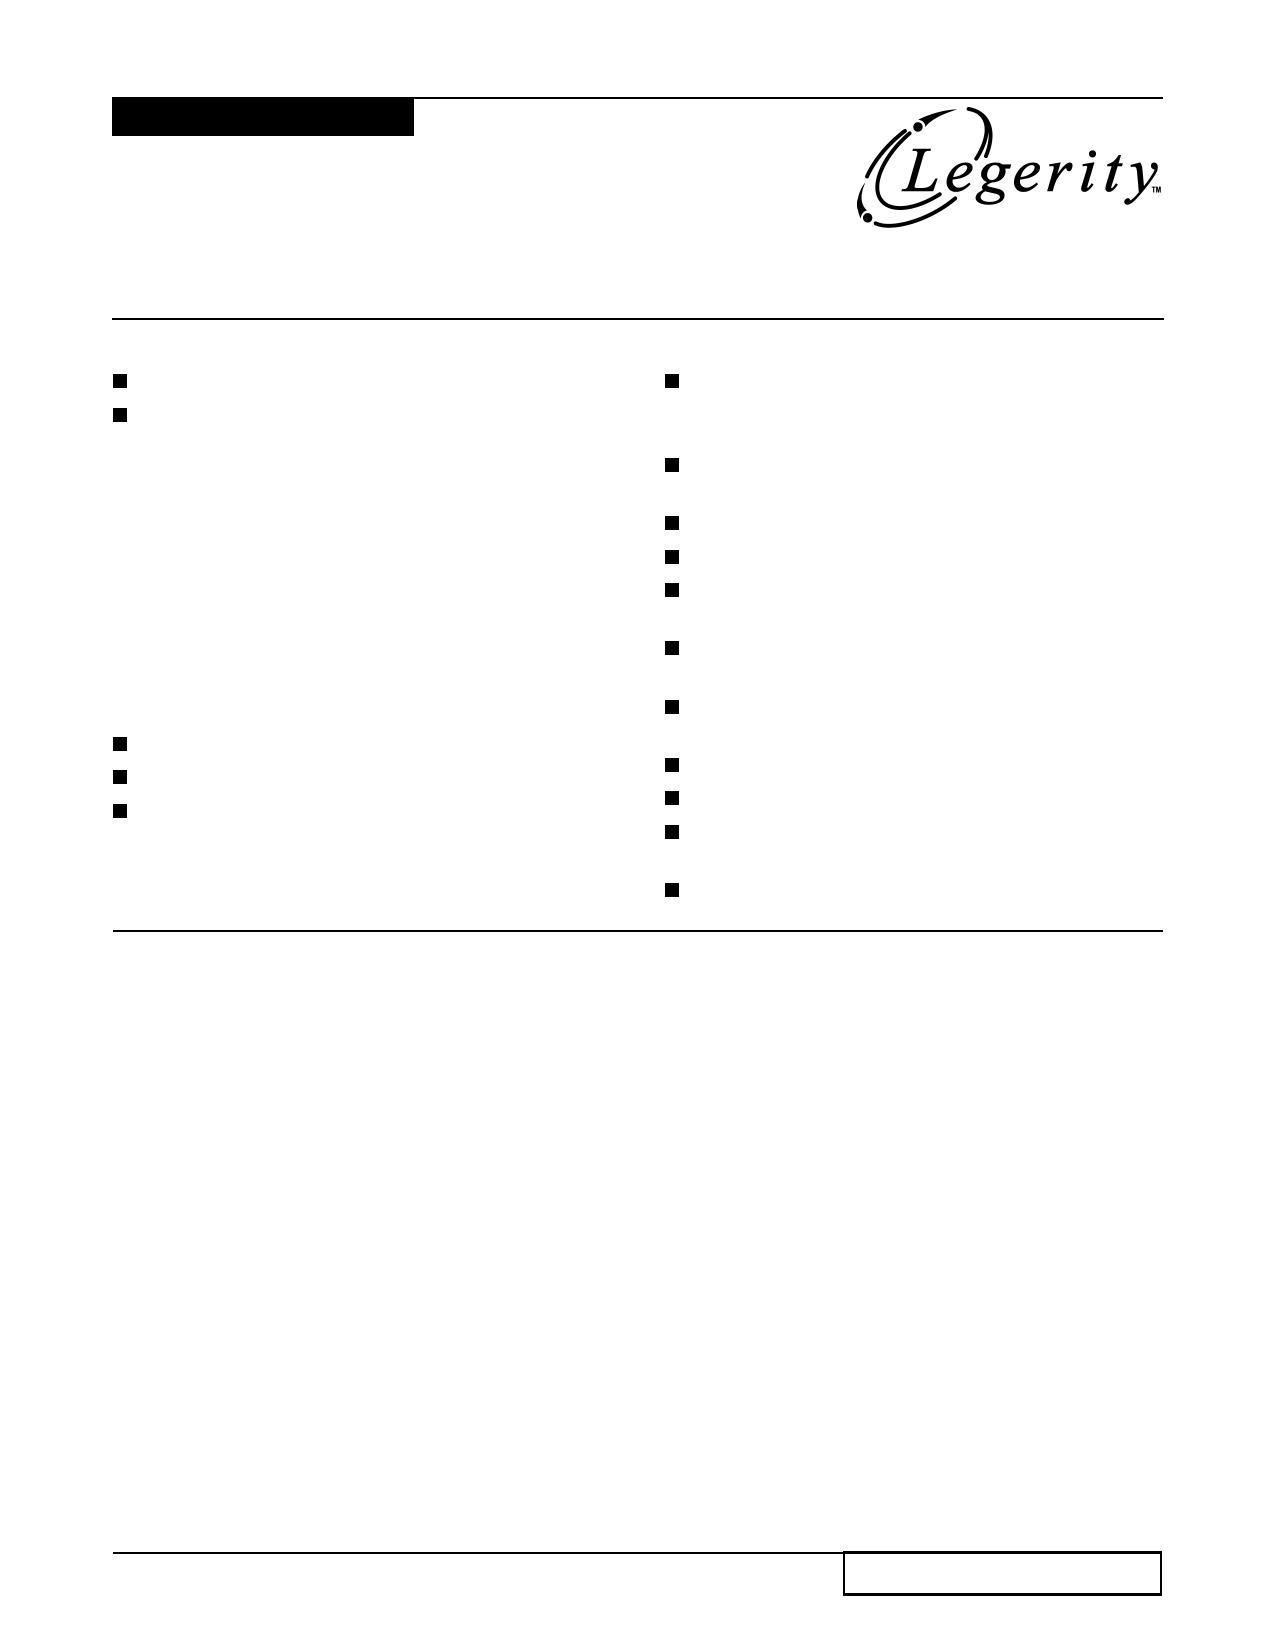 Am79Q02 datasheet